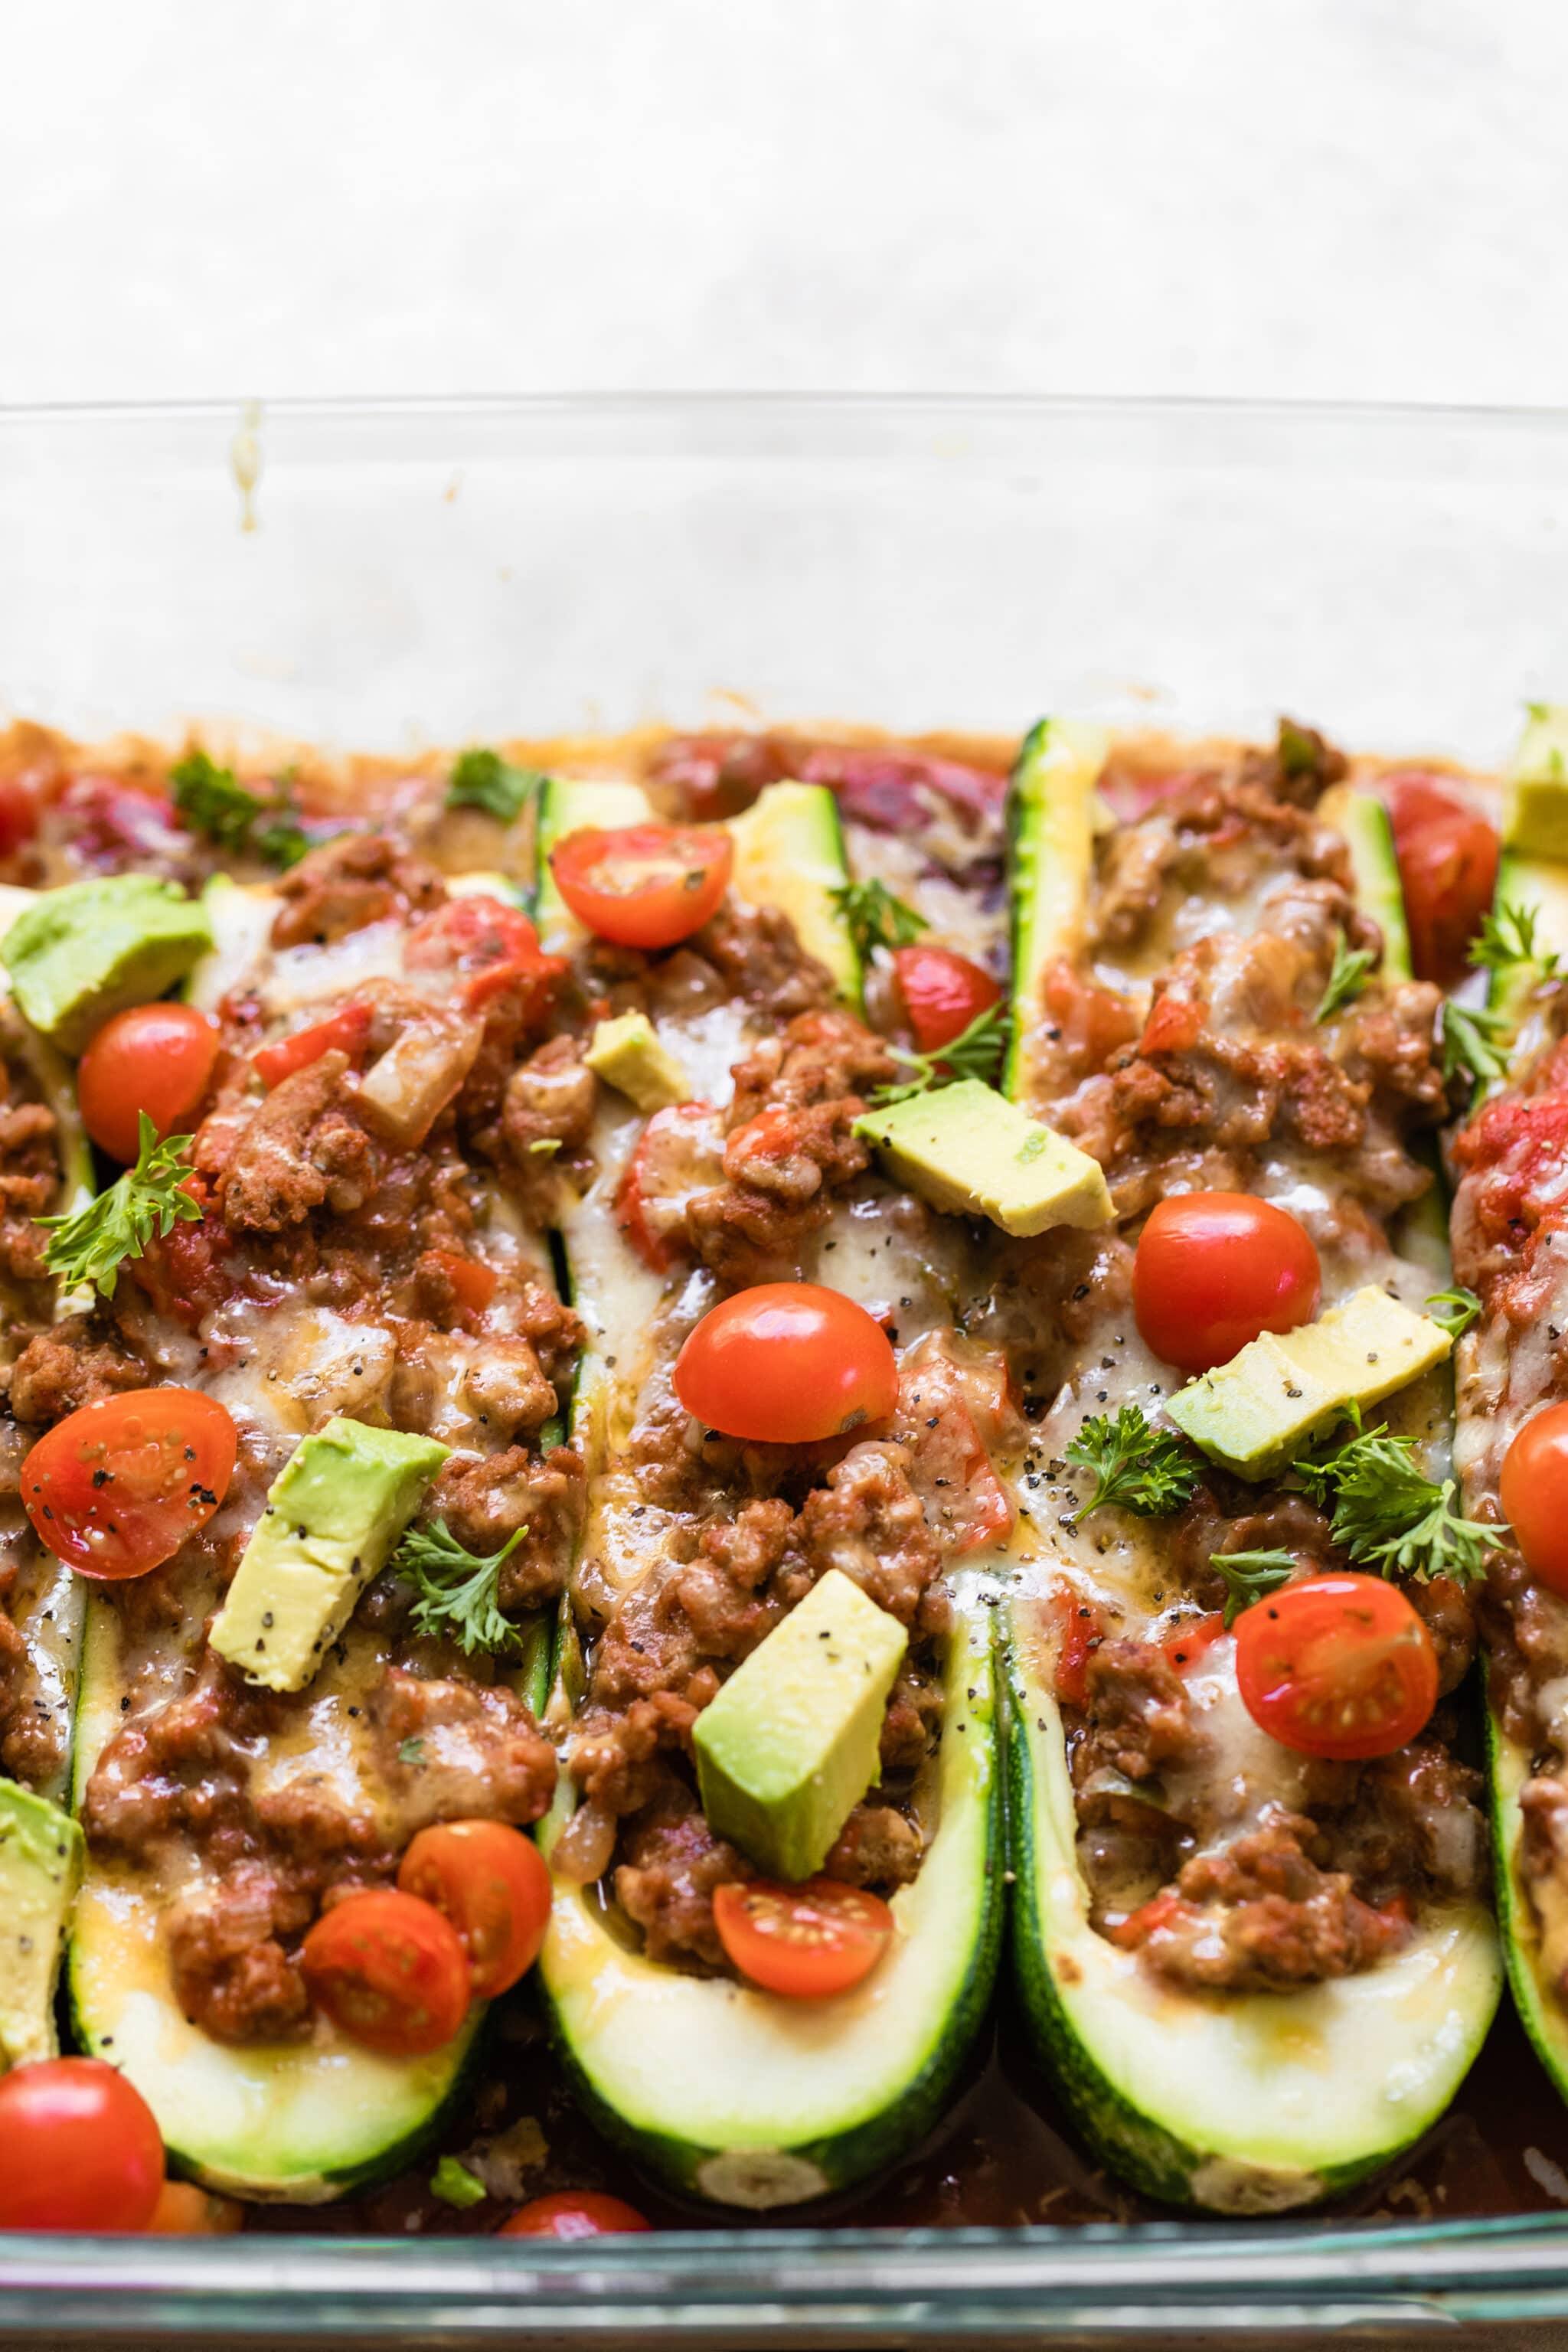 zucchini taco boats in a glass Pyrex dish